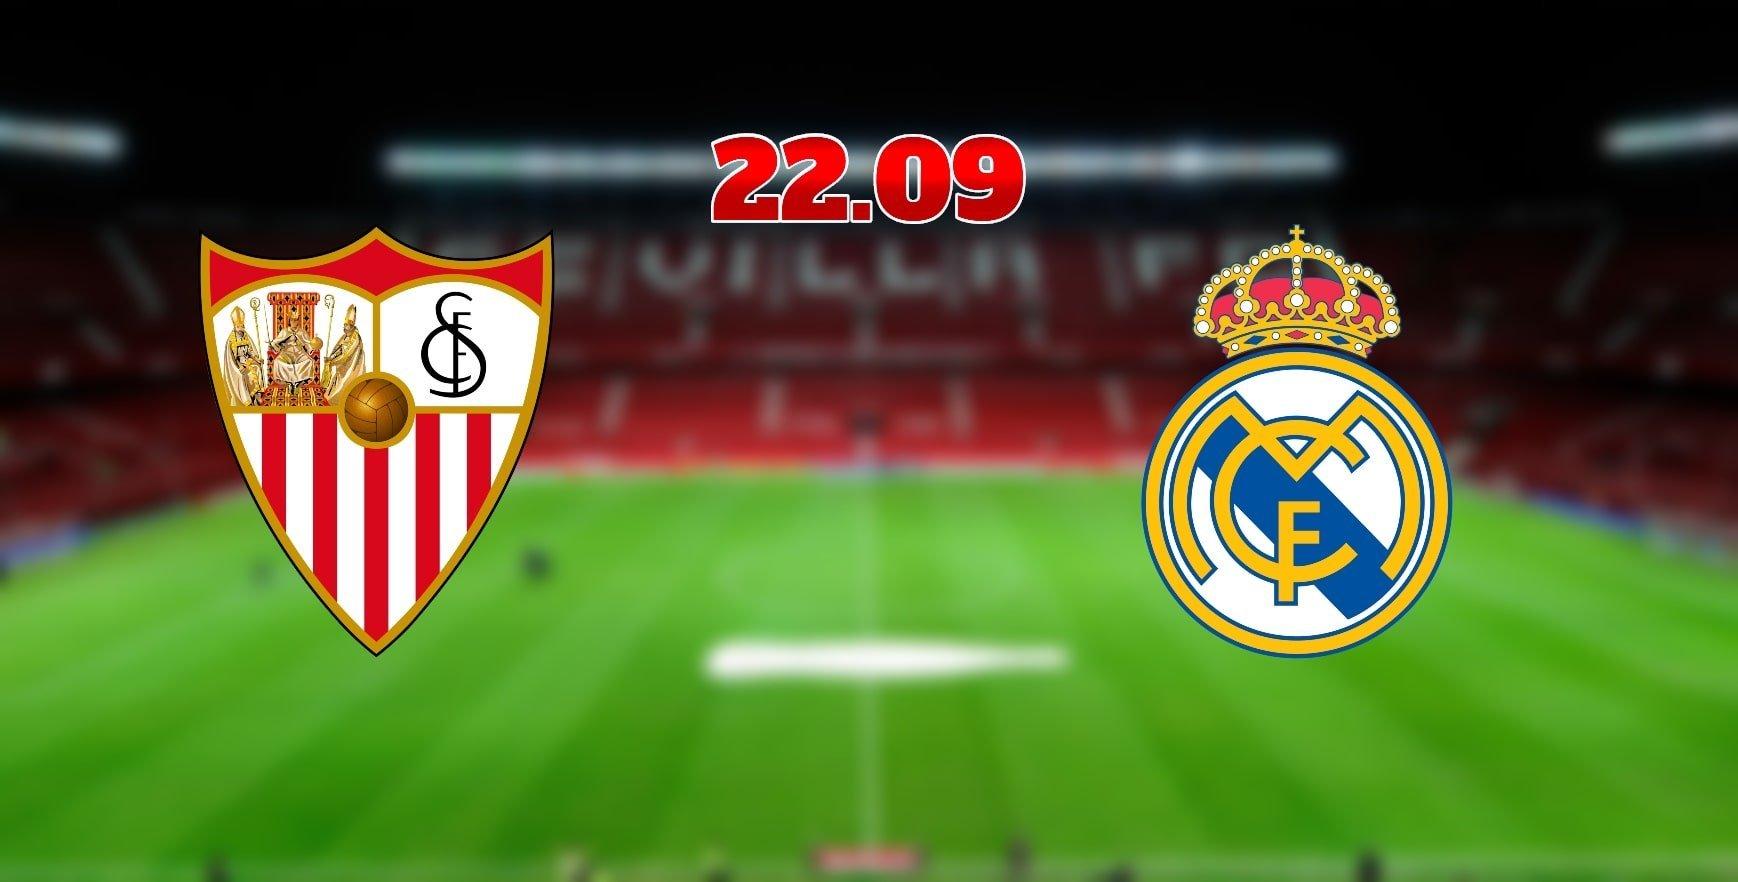 Sevilla vs Real Madrid Prediction: 22.09.2019 La Liga